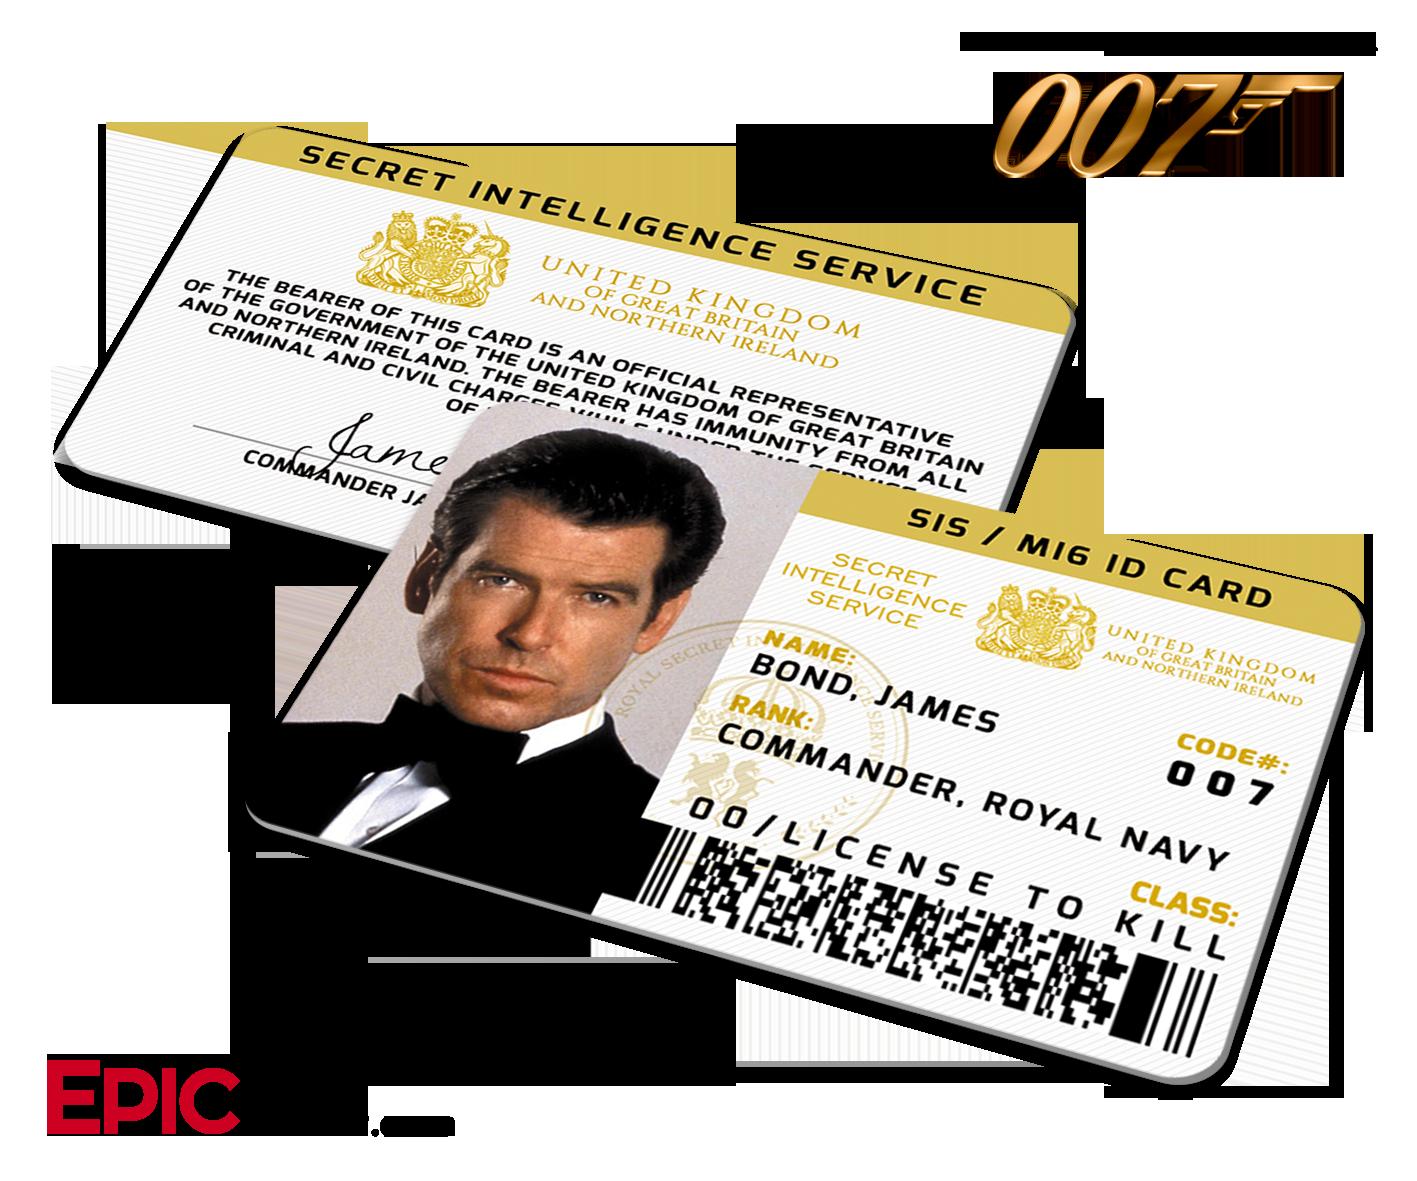 James Bond 007 Inspired Pierce Brosnan Secret Intelligence Service Id James Bond James Bond Movie Posters James Bond Movies